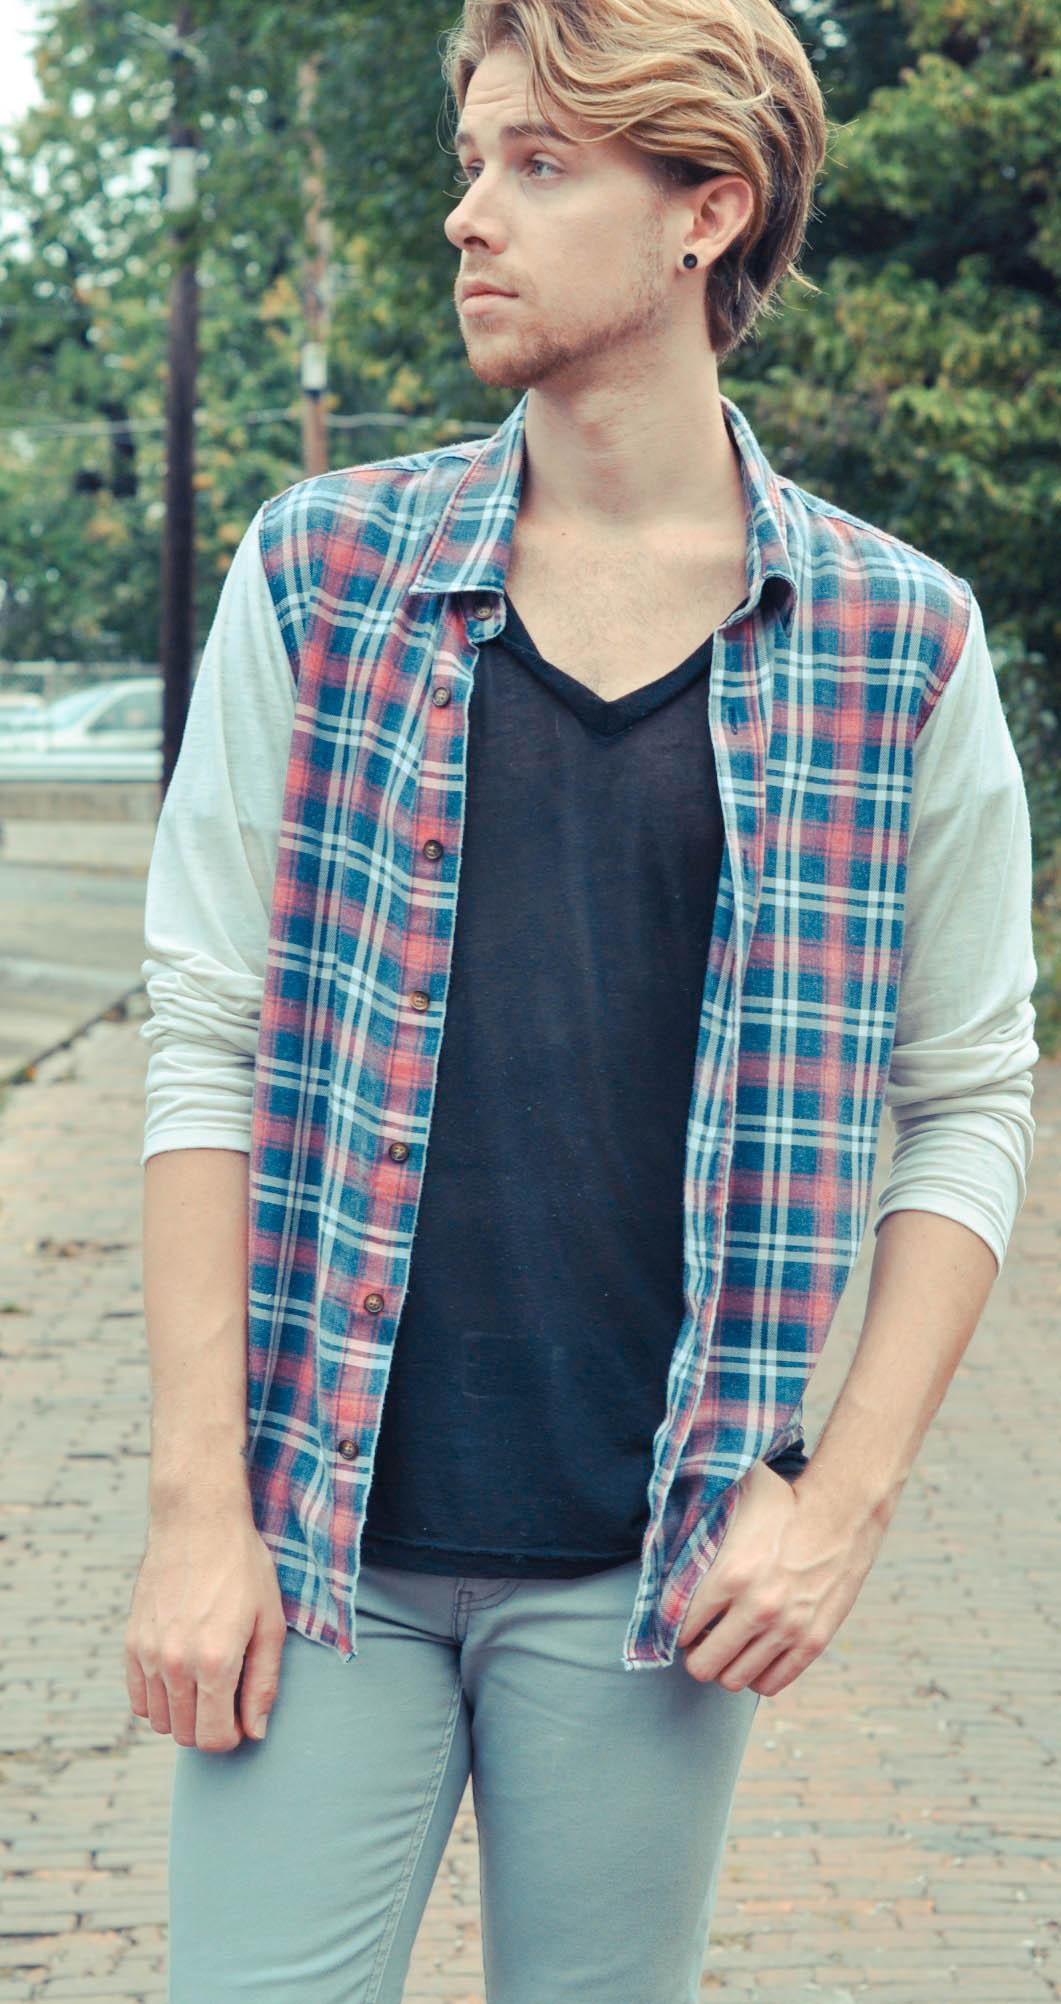 american-apparel-v-neck-t-shirt-color-fast-plaid-shirt-levis-jeans